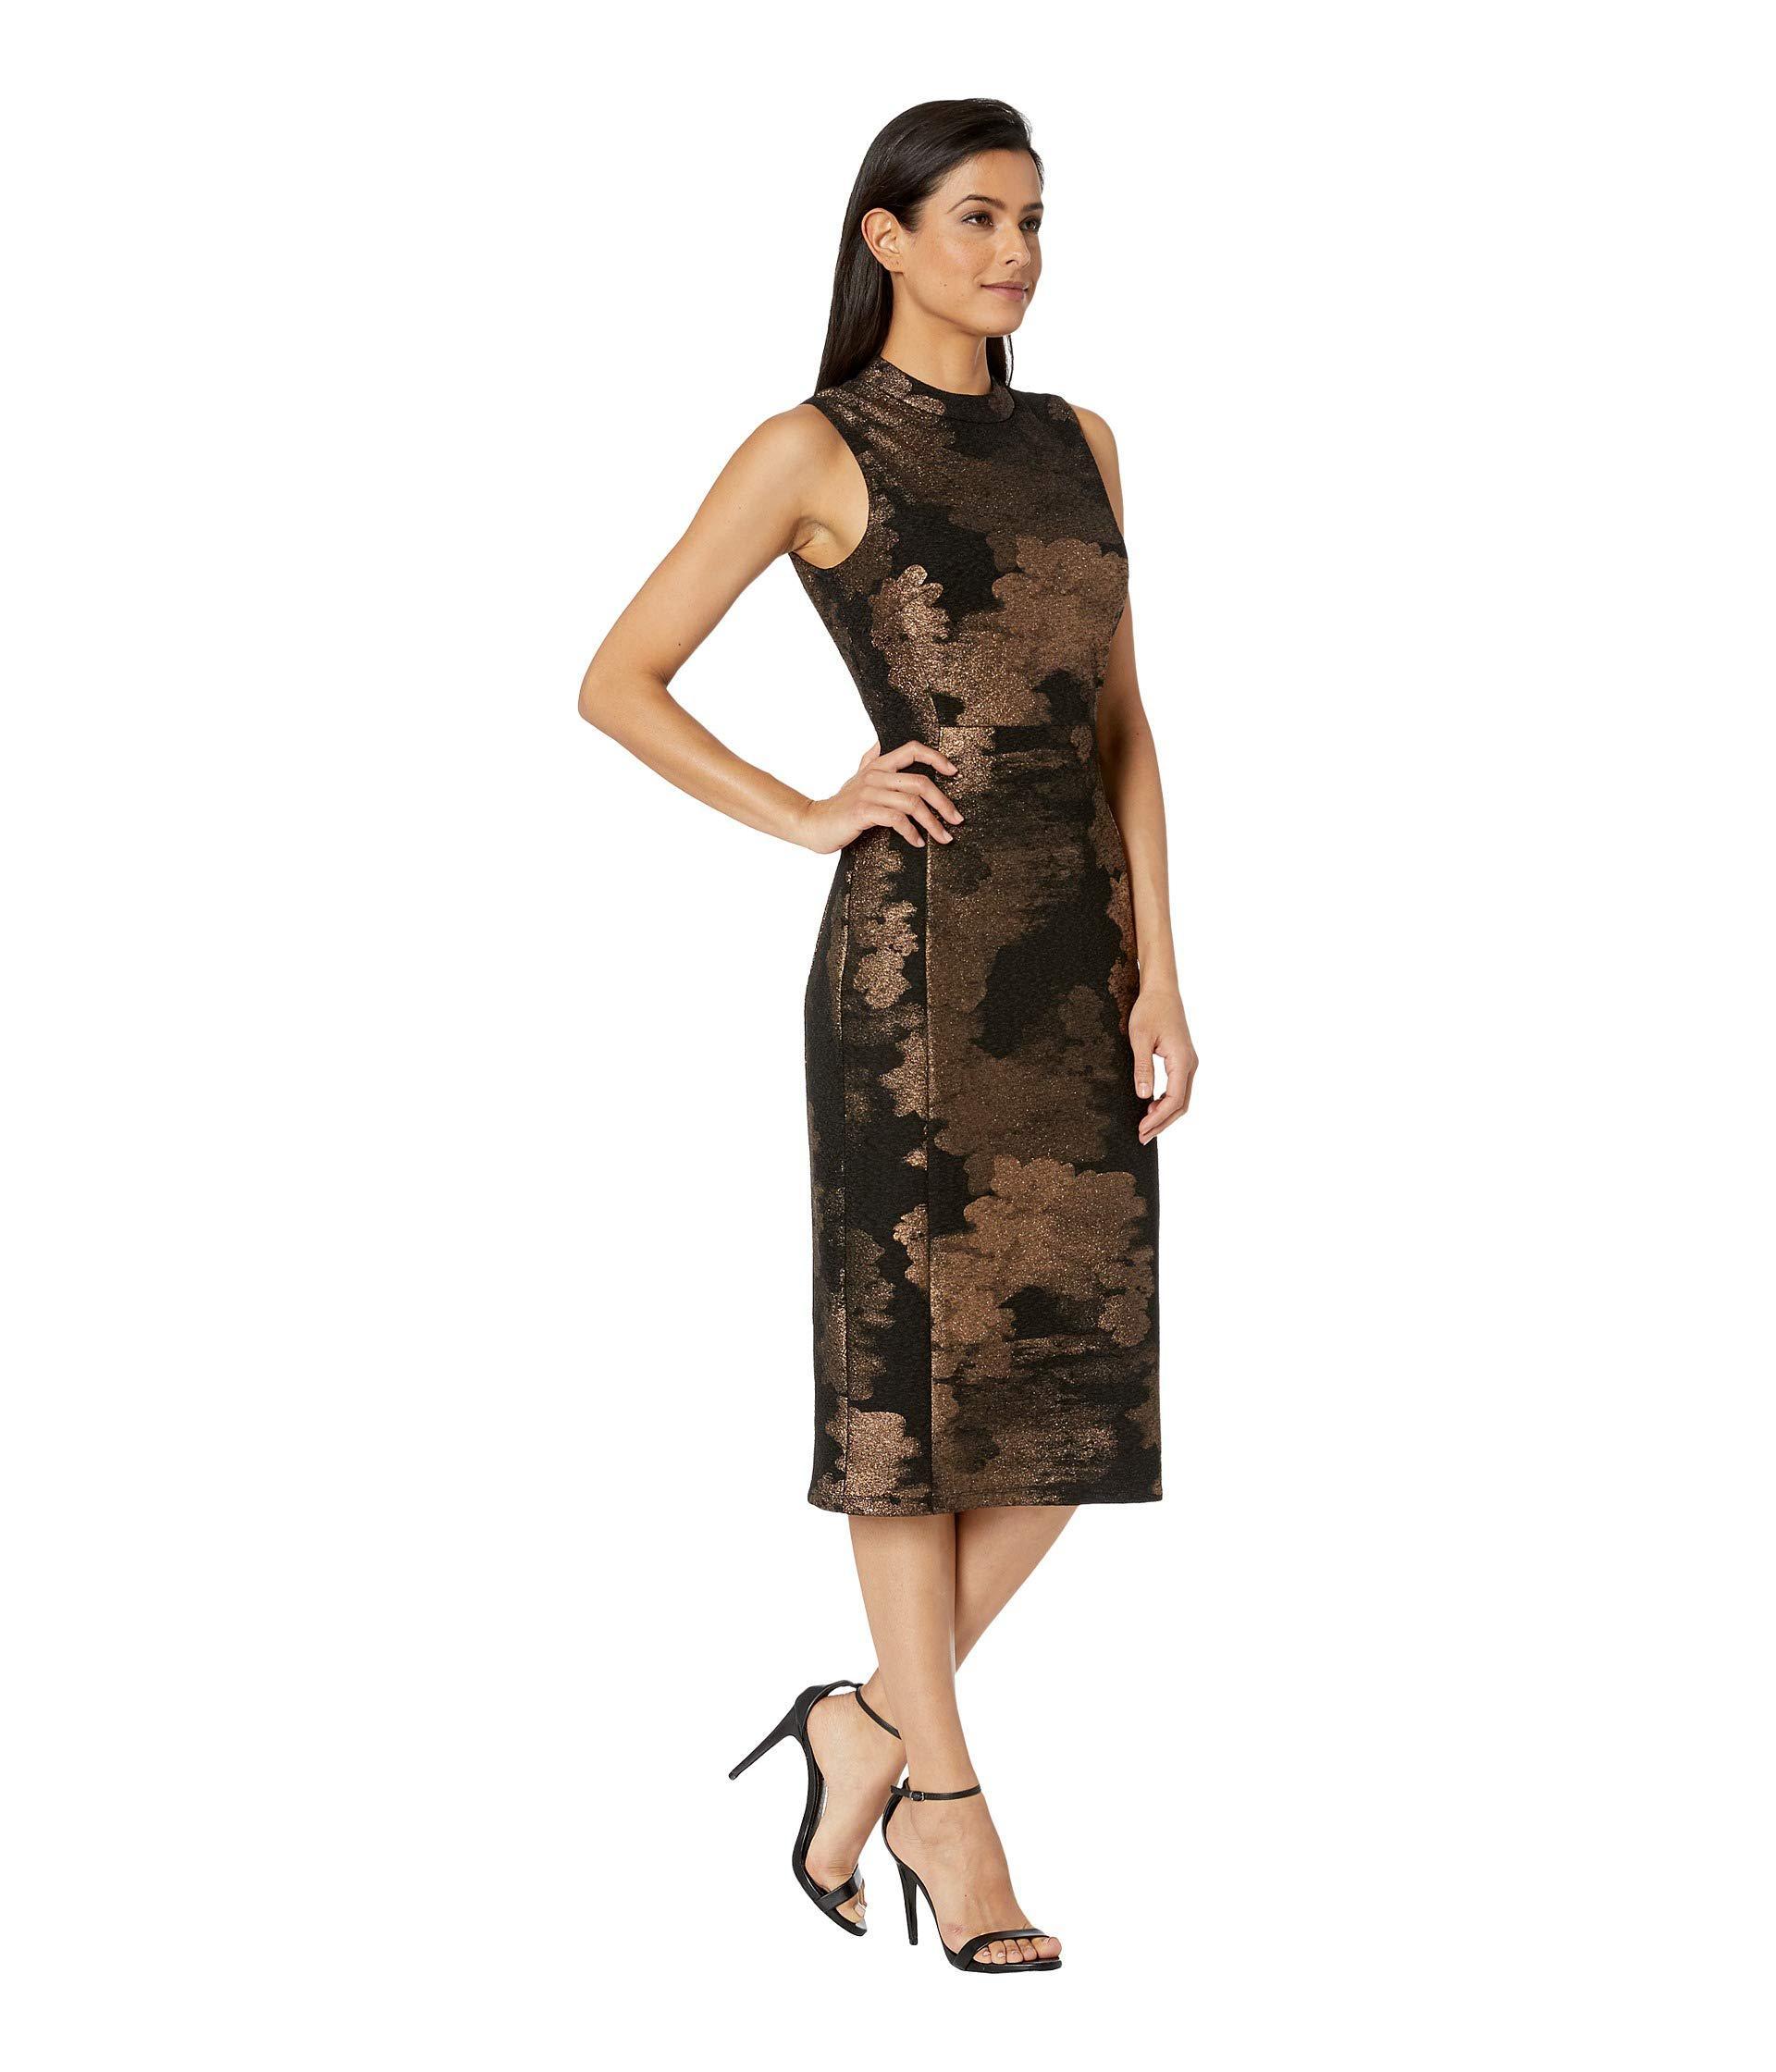 72513288c3261 Lyst - Nine West Novelty Knit Mock Turtleneck Sheath Dress in Black